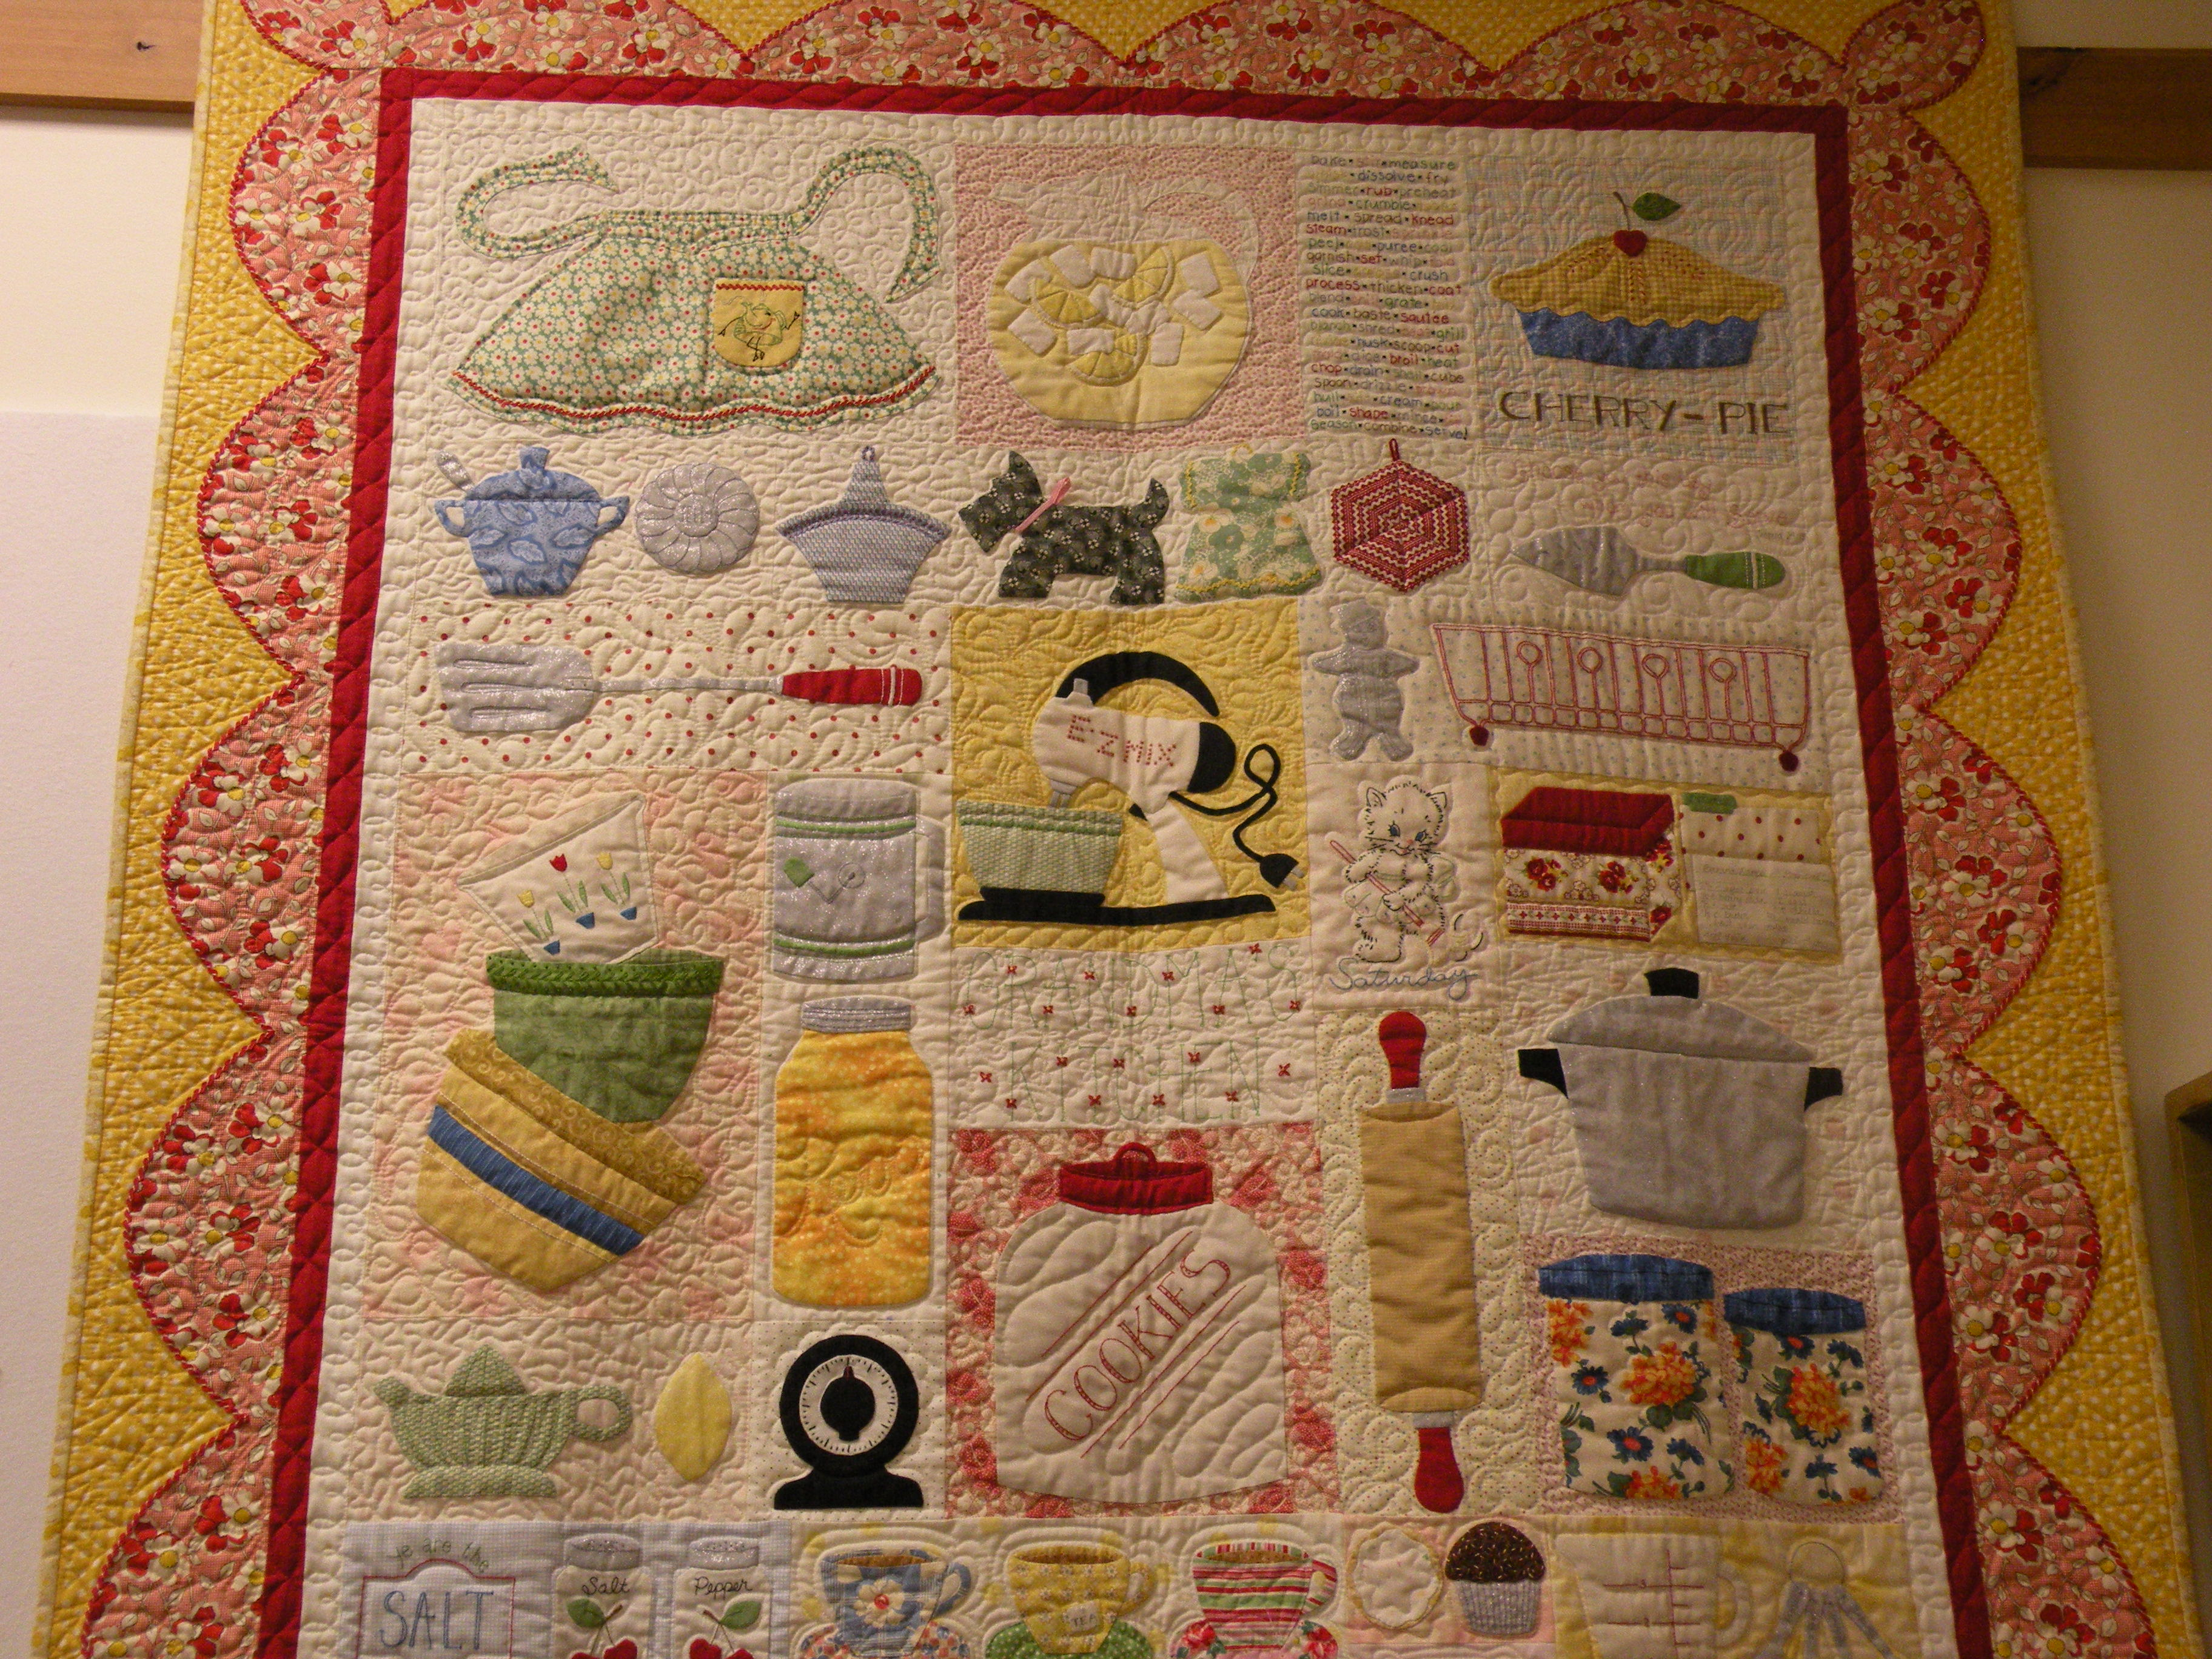 Pots and Pins, Creativity, Quilts, DIY Projects, Grandbabies, Parties : lori holt quilt patterns - Adamdwight.com